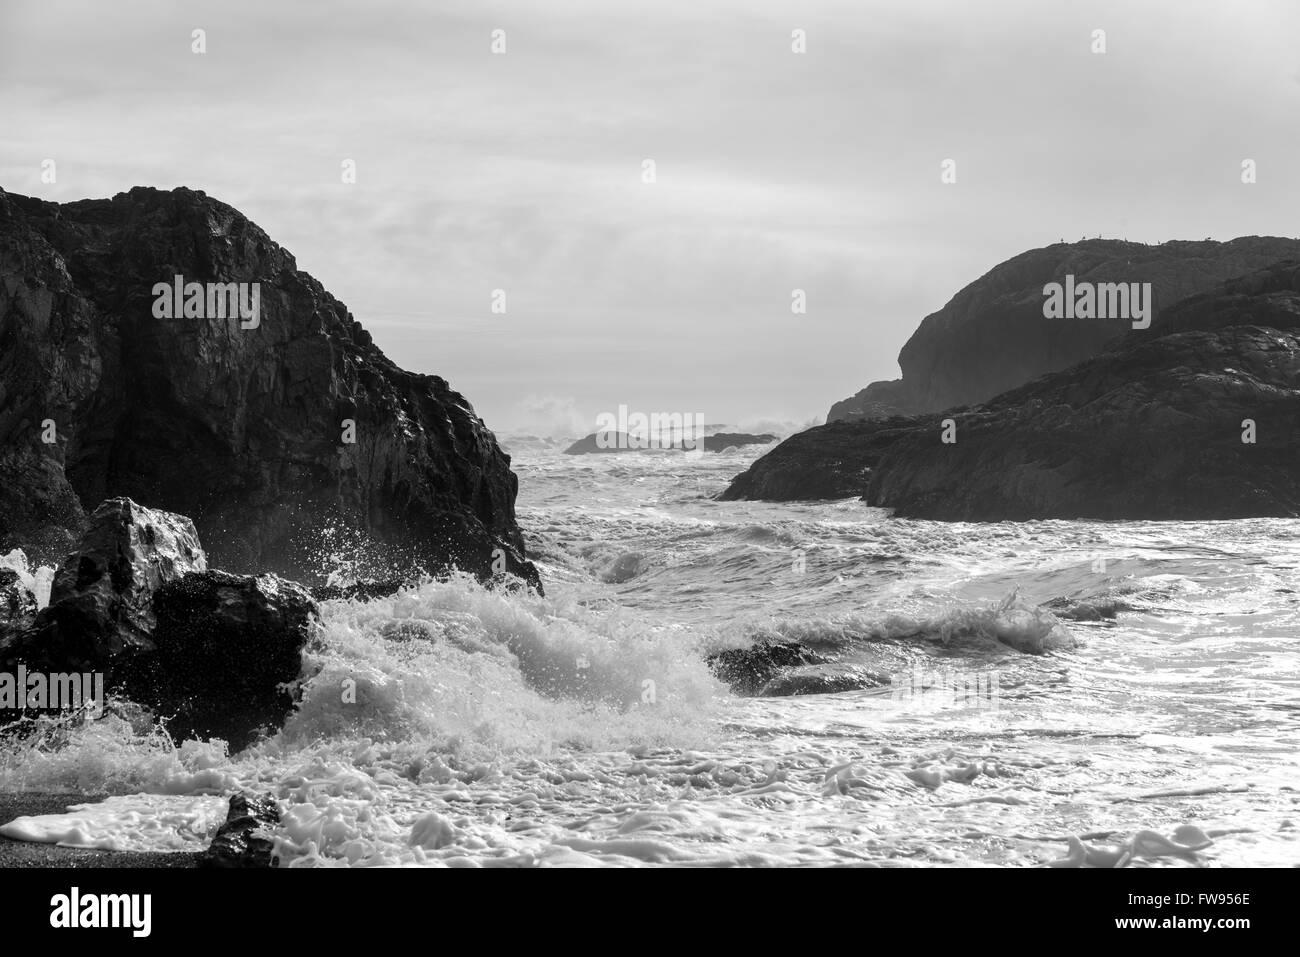 Wave splashing at coastline, Pacific Rim National Park Reserve, Tofino, Vancouver Island, British Columbia, Canada Stock Photo